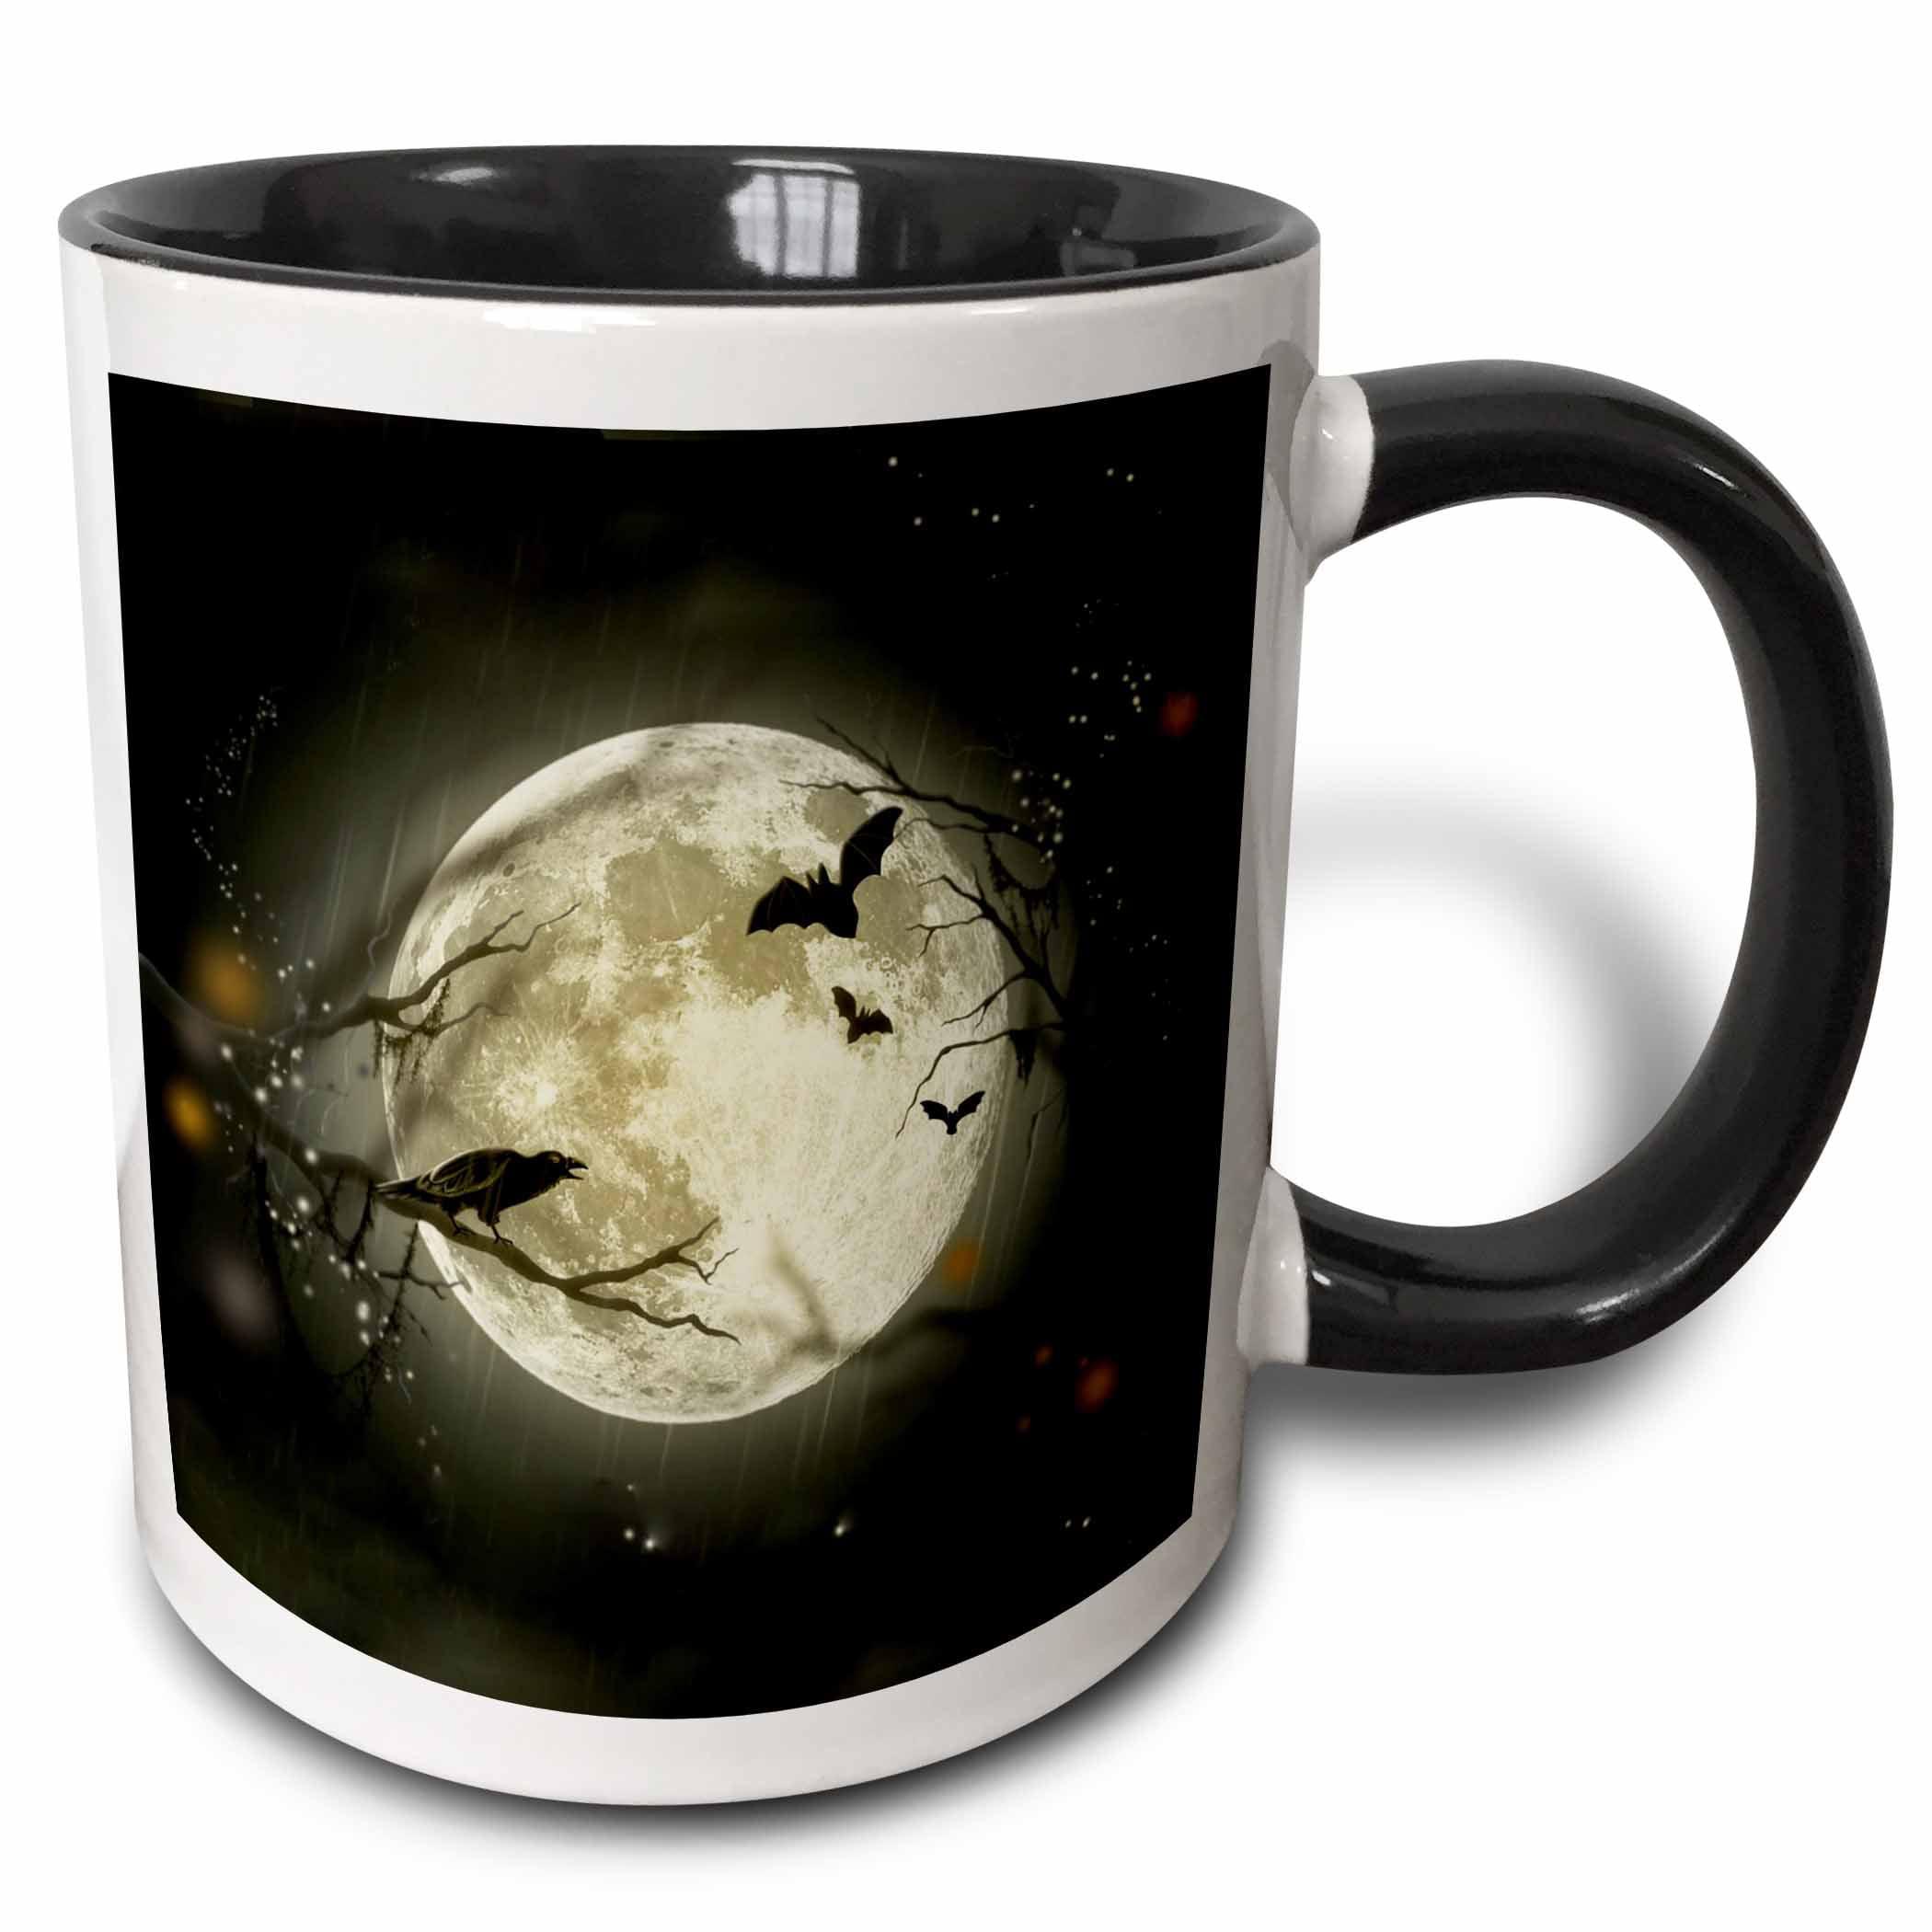 3dRose Full Moon with a Crow and Bats, Two Tone Black Mug, 11oz